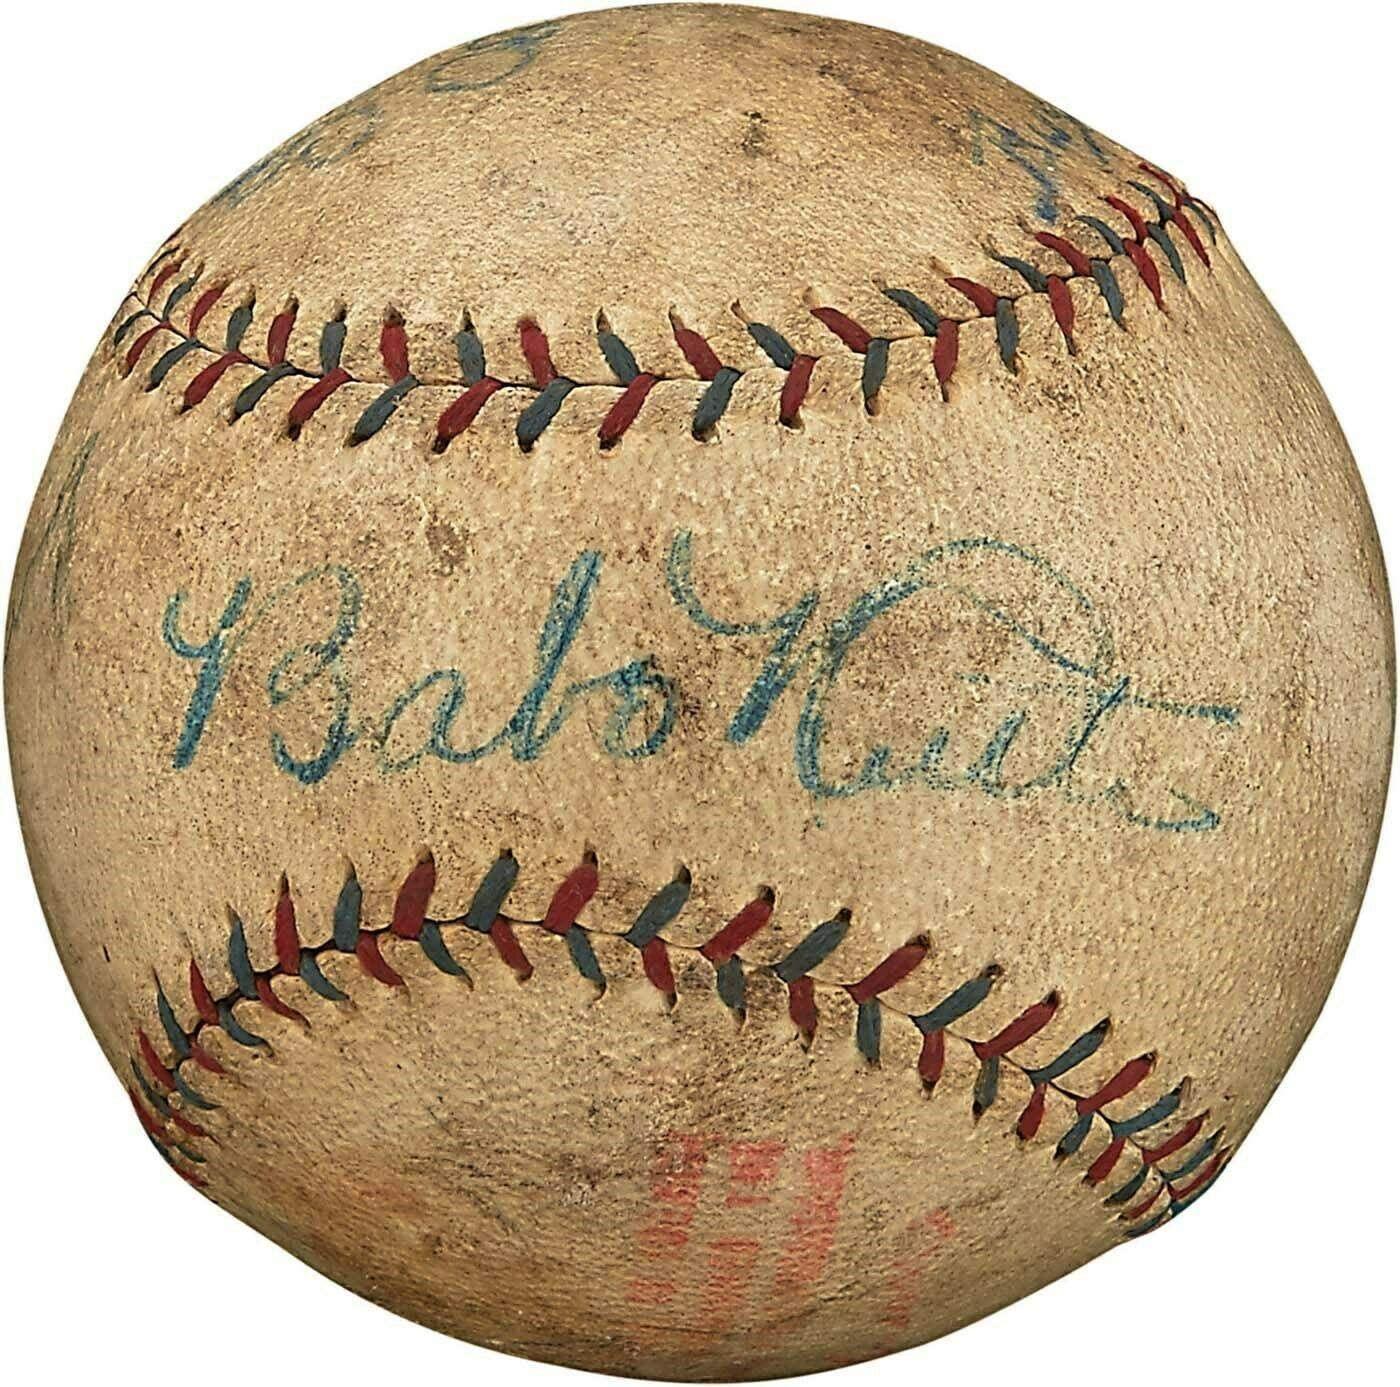 Yankees Babe Ruth & Lou Gehrig Signed 1927 Ban Johnson Oal Baseball #AC02735 - PSA/DNA Certified - Autographed Baseballs